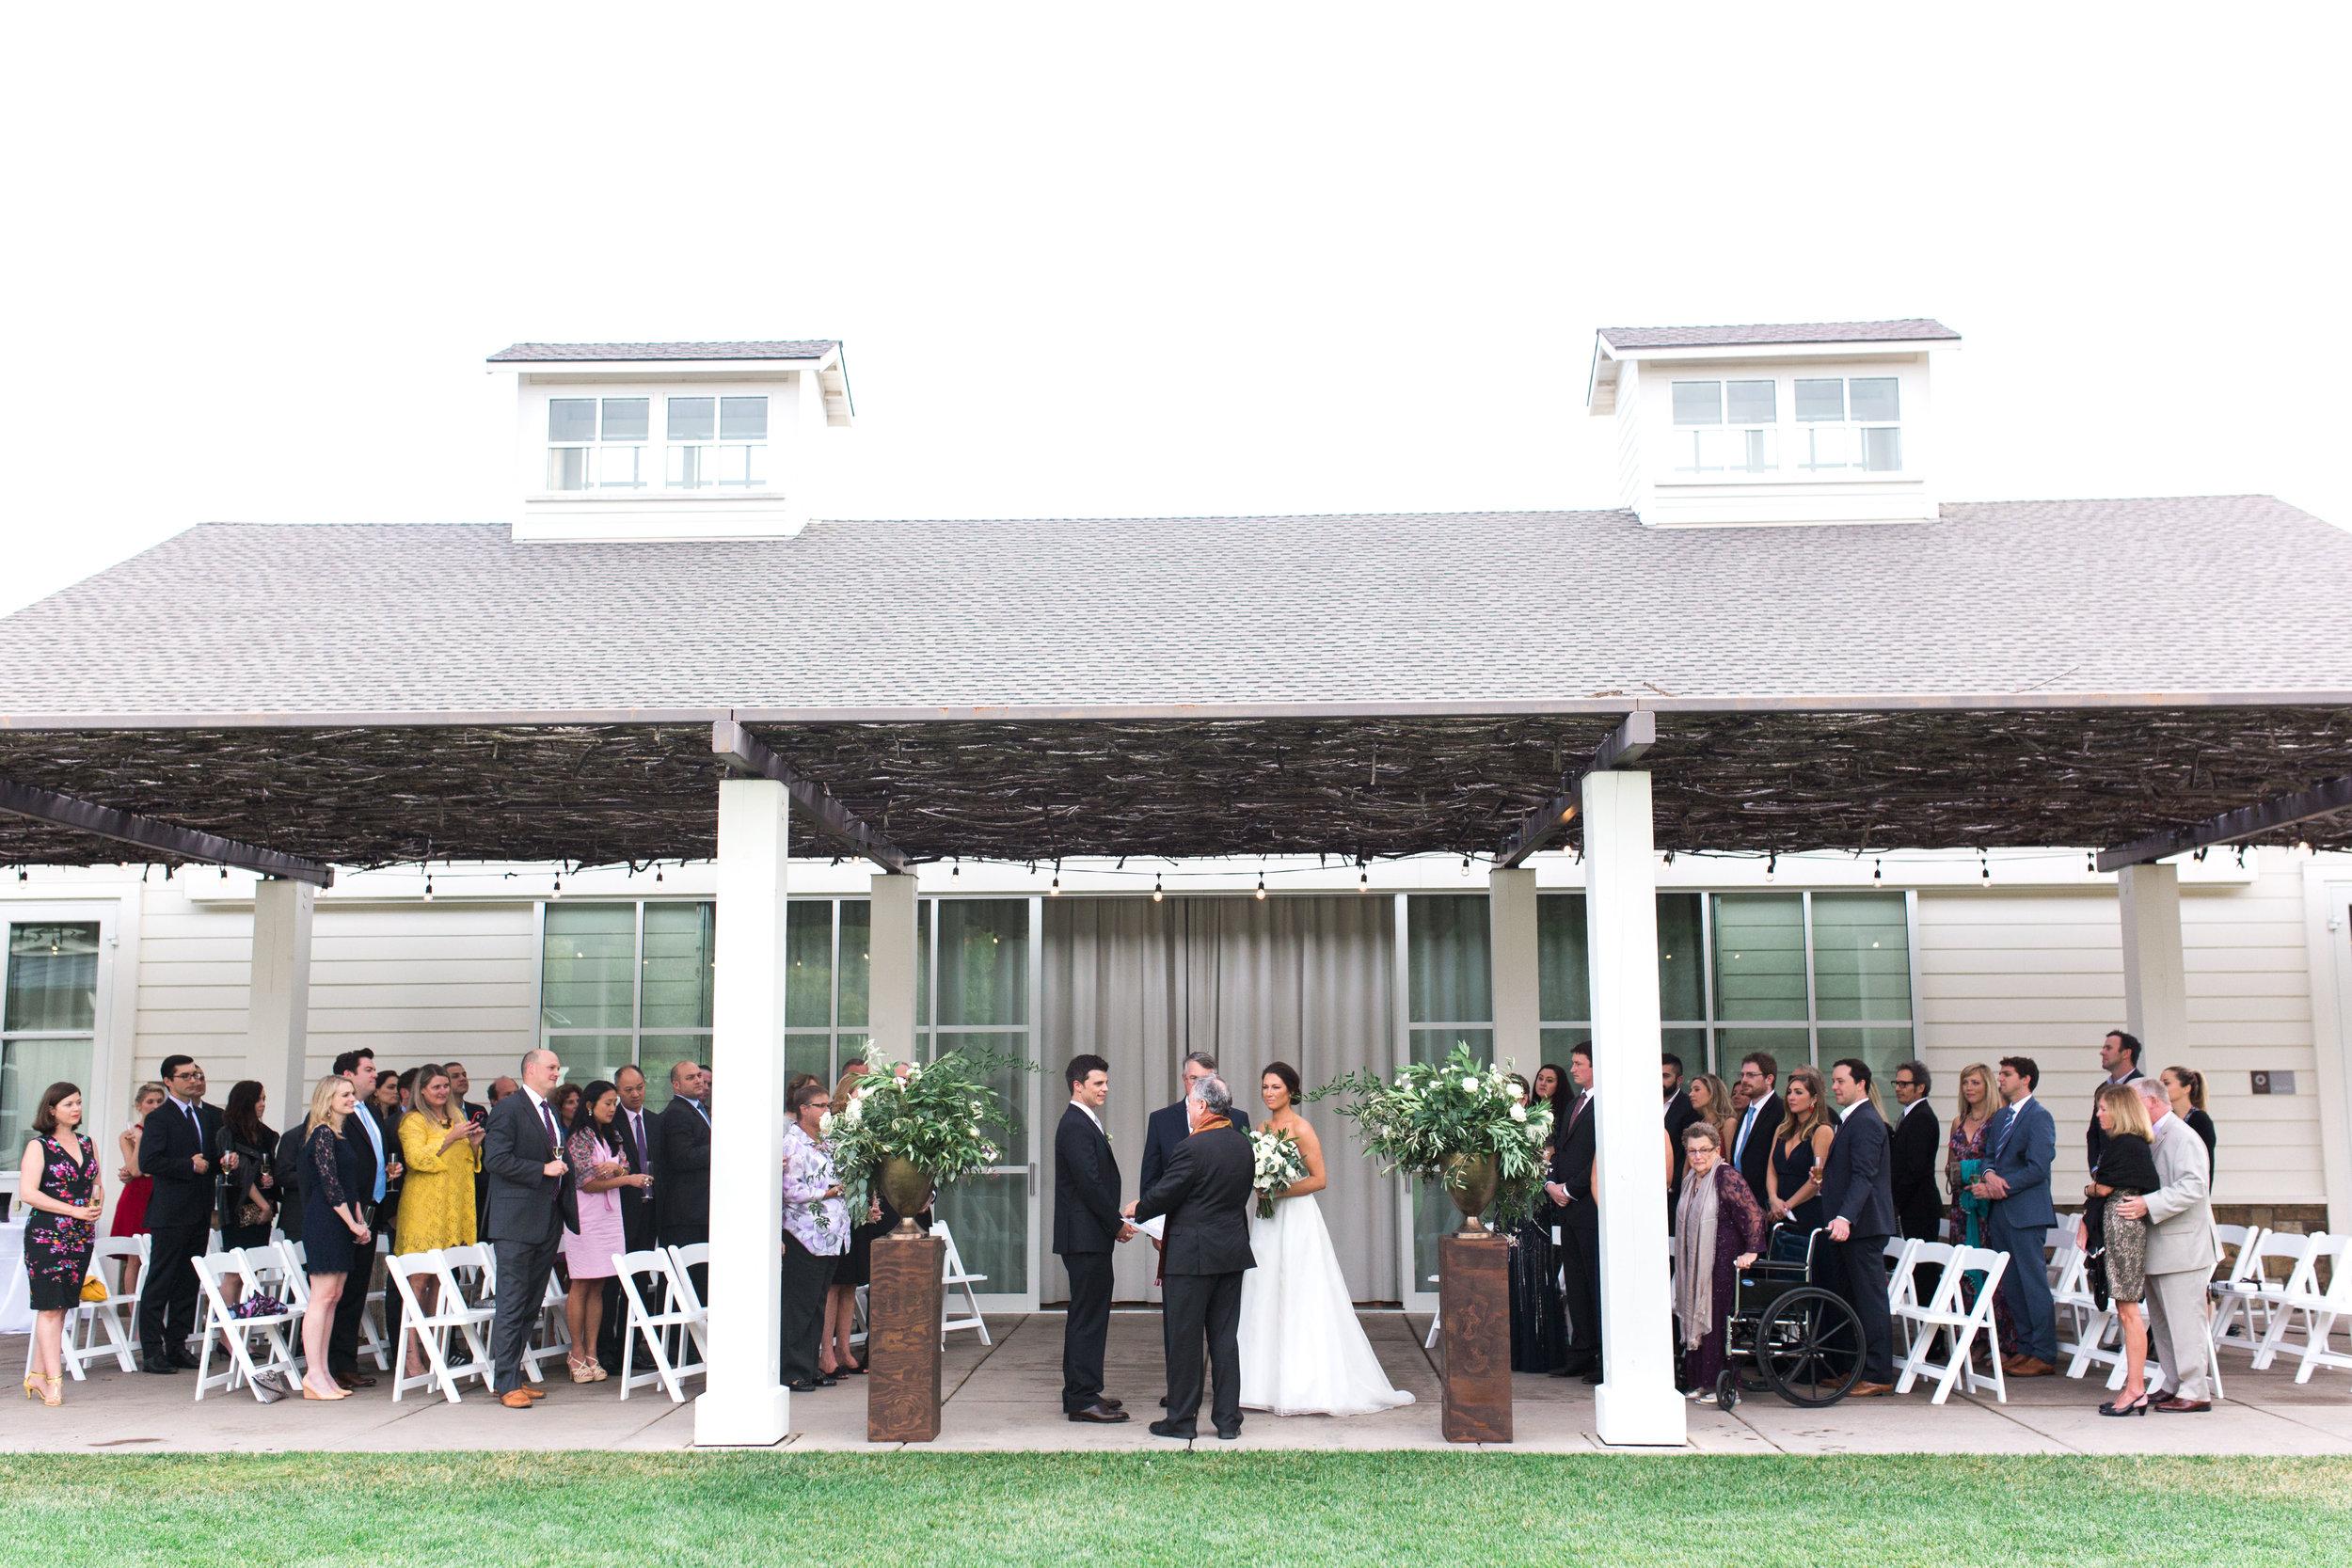 intimate-wedding-at-solage-calistoga-in-napa-59.jpg